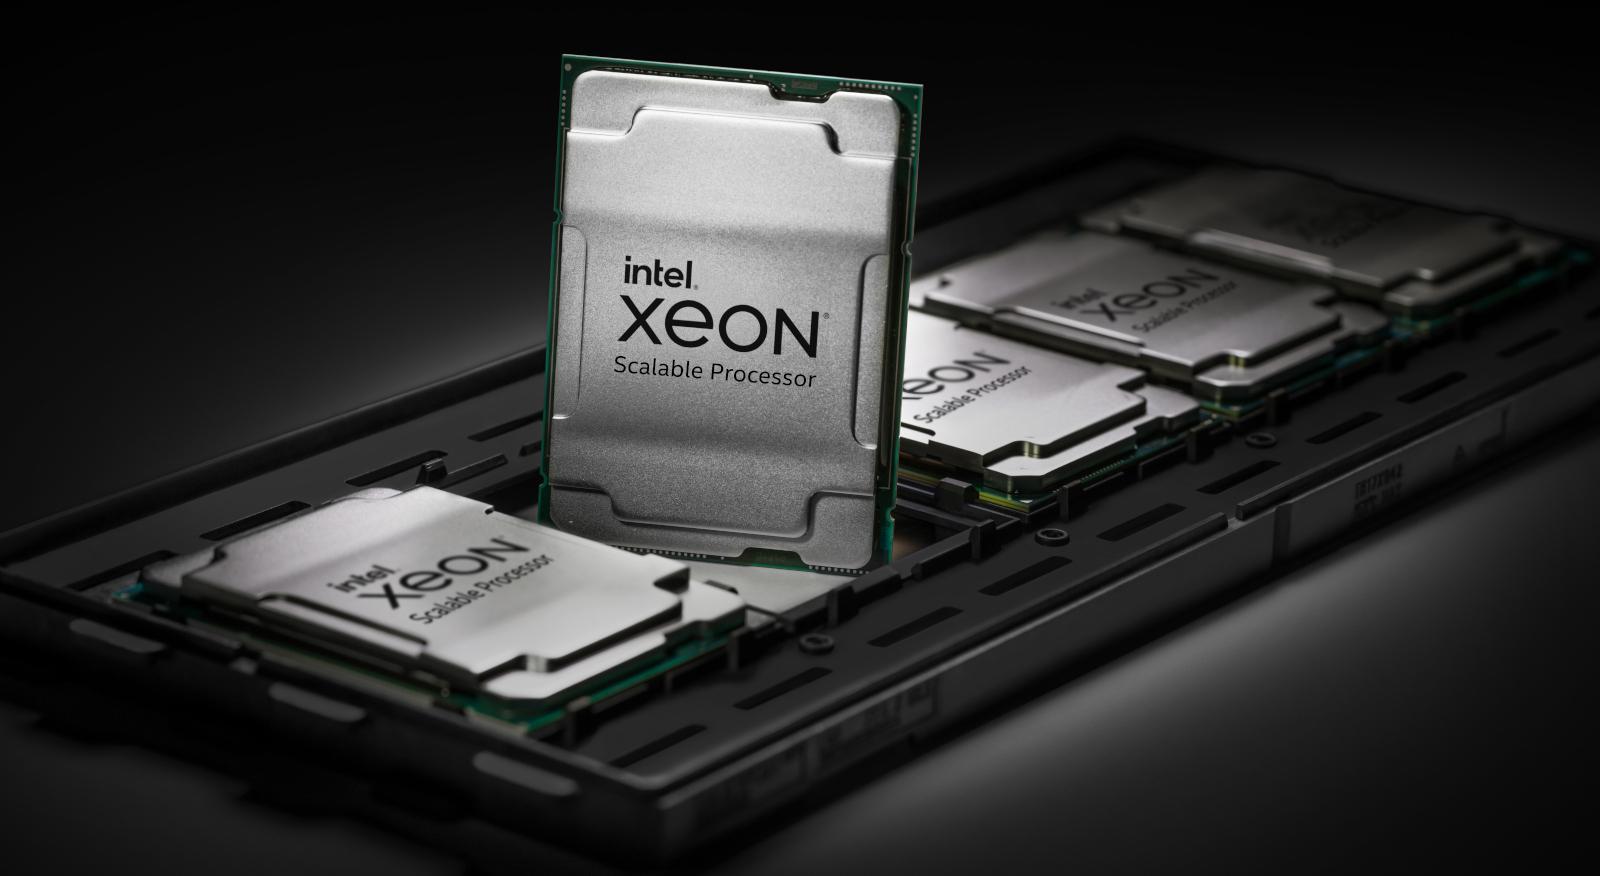 Новая статья: Обзор Intel Xeon Ice Lake-SP: долго запрягали